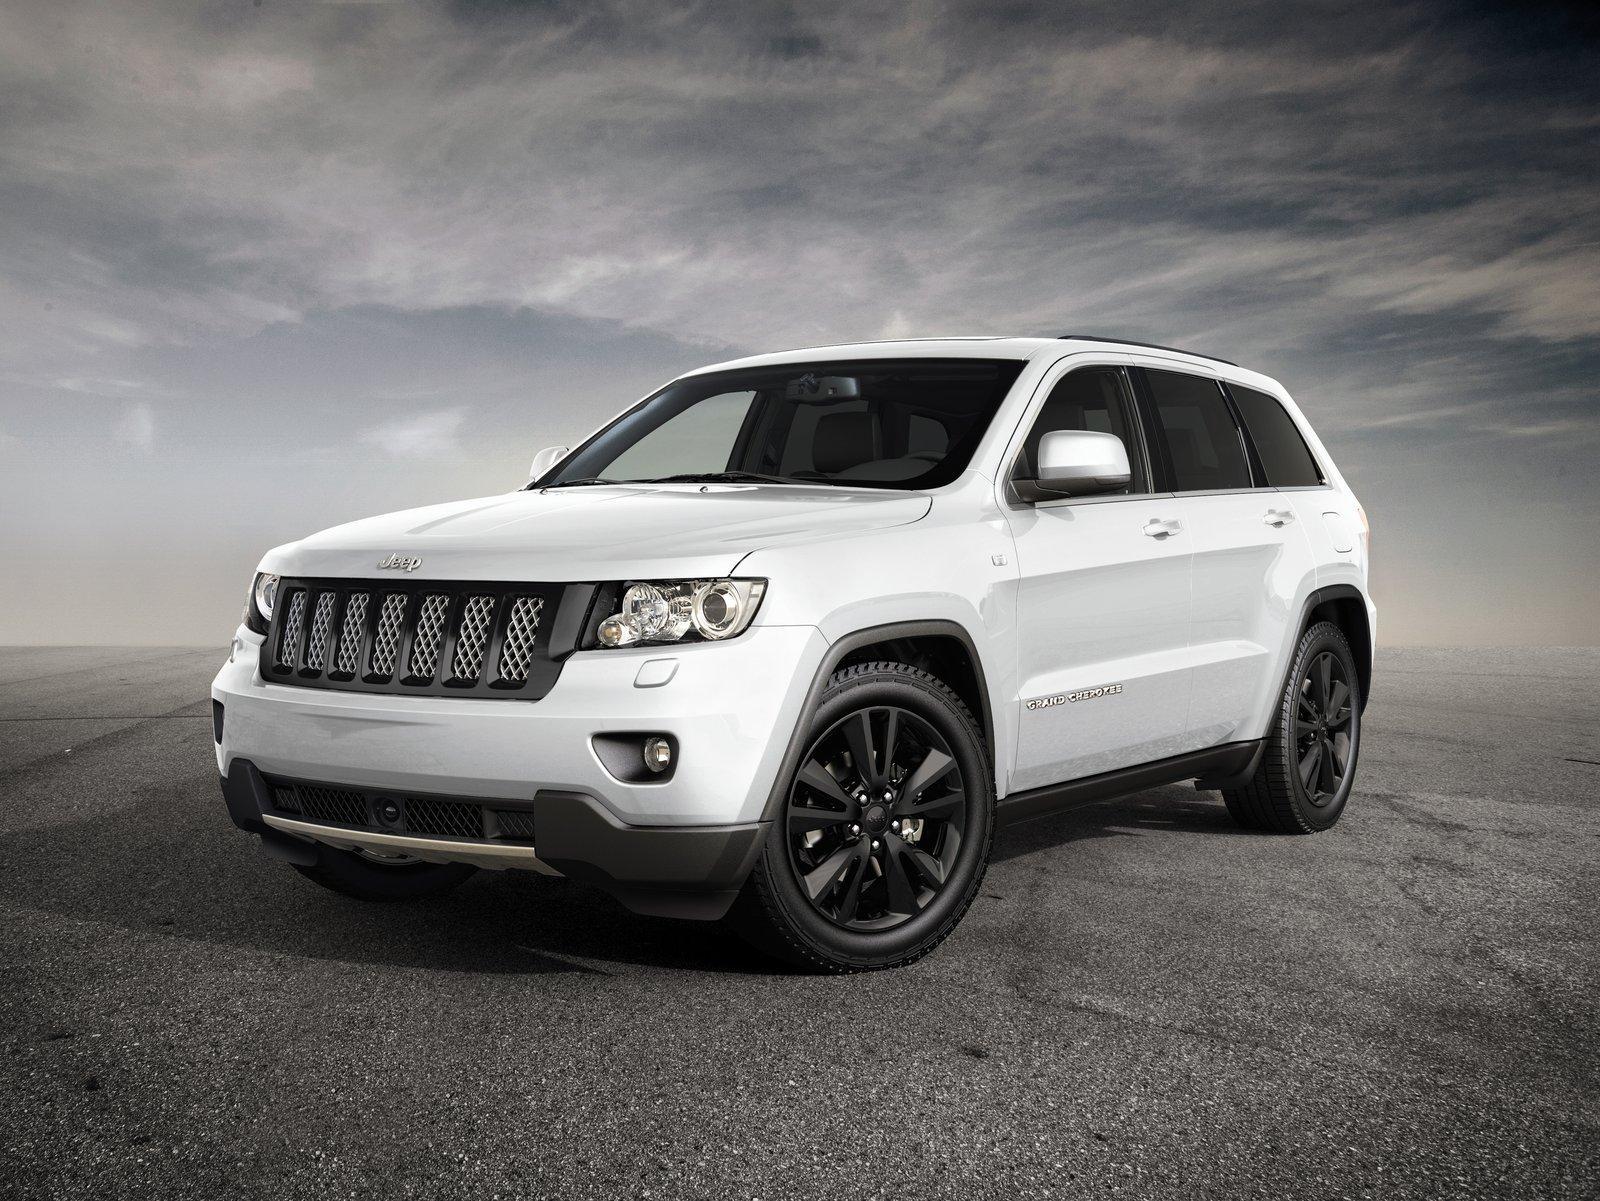 http://images.caradisiac.com/images/6/5/0/2/76502/S0-Un-Jeep-Grand-Cherokee-Sports-Concept-au-Salon-de-Geneve-254827.jpg